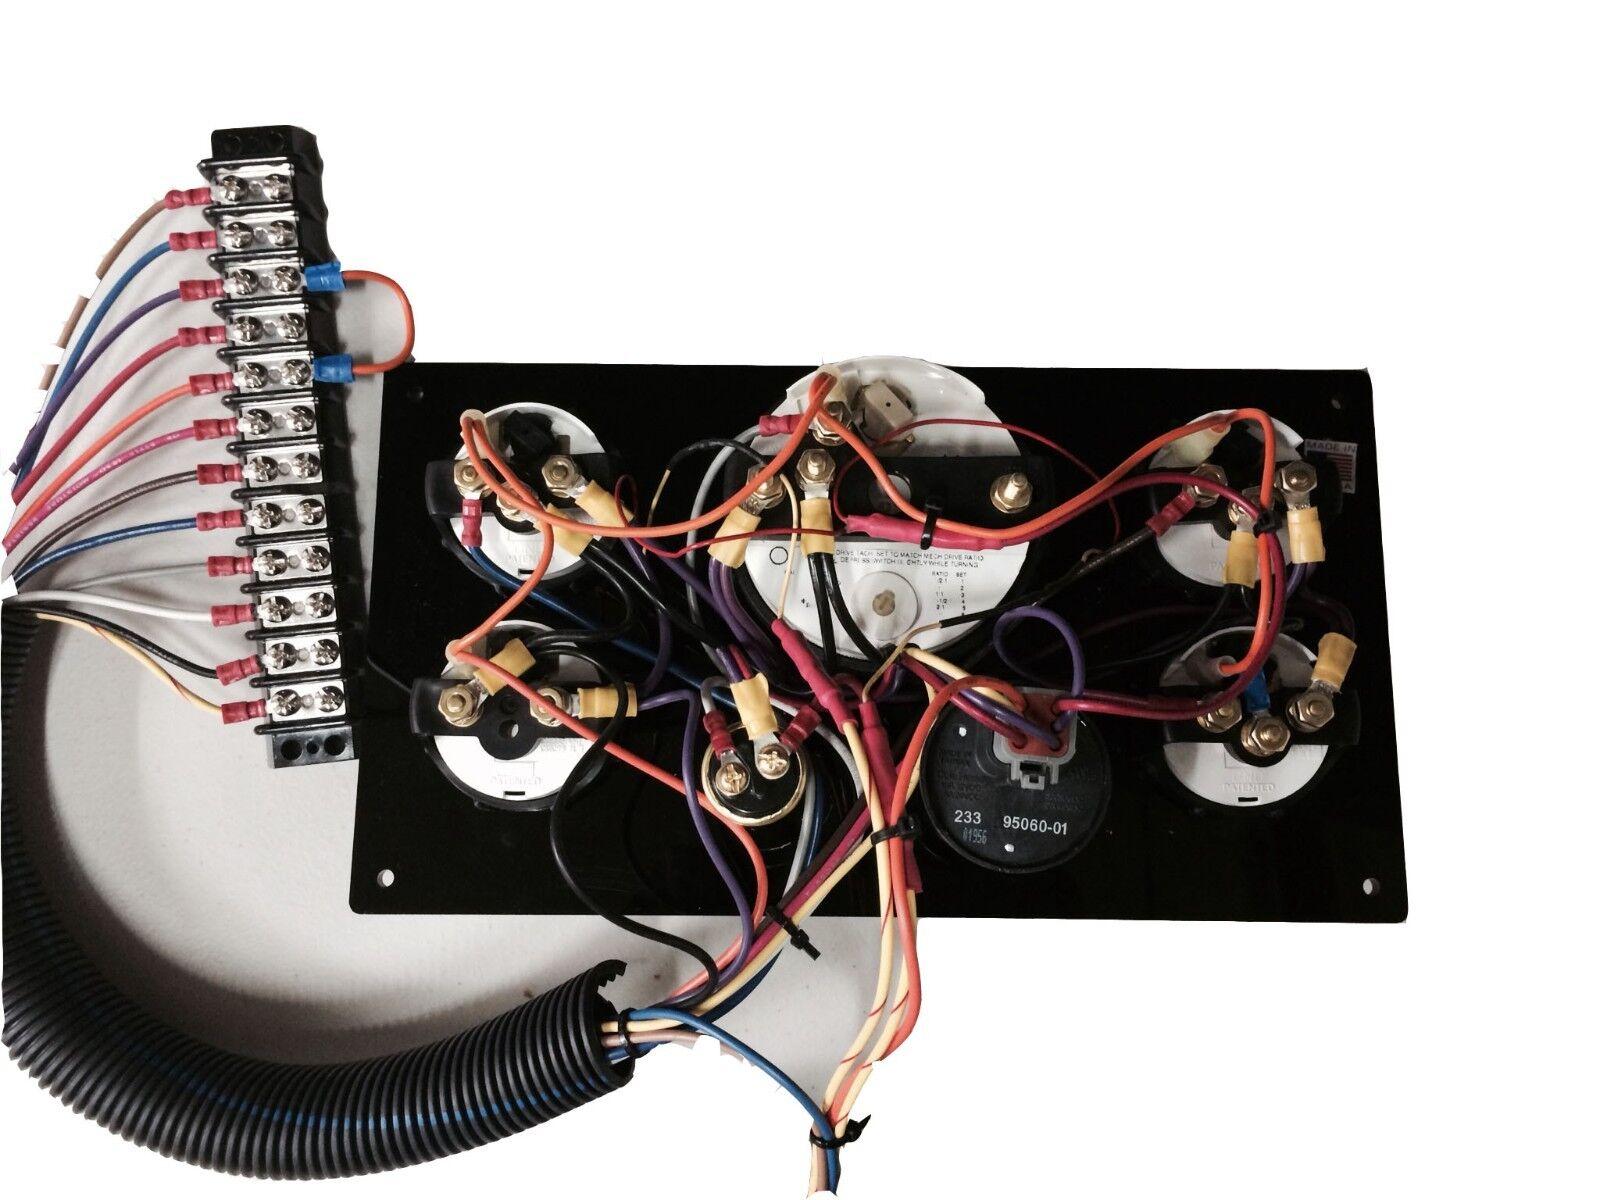 hight resolution of  caterpillar wiring harness on caterpillar c15 engine harness caterpillar c15 wiring diagram